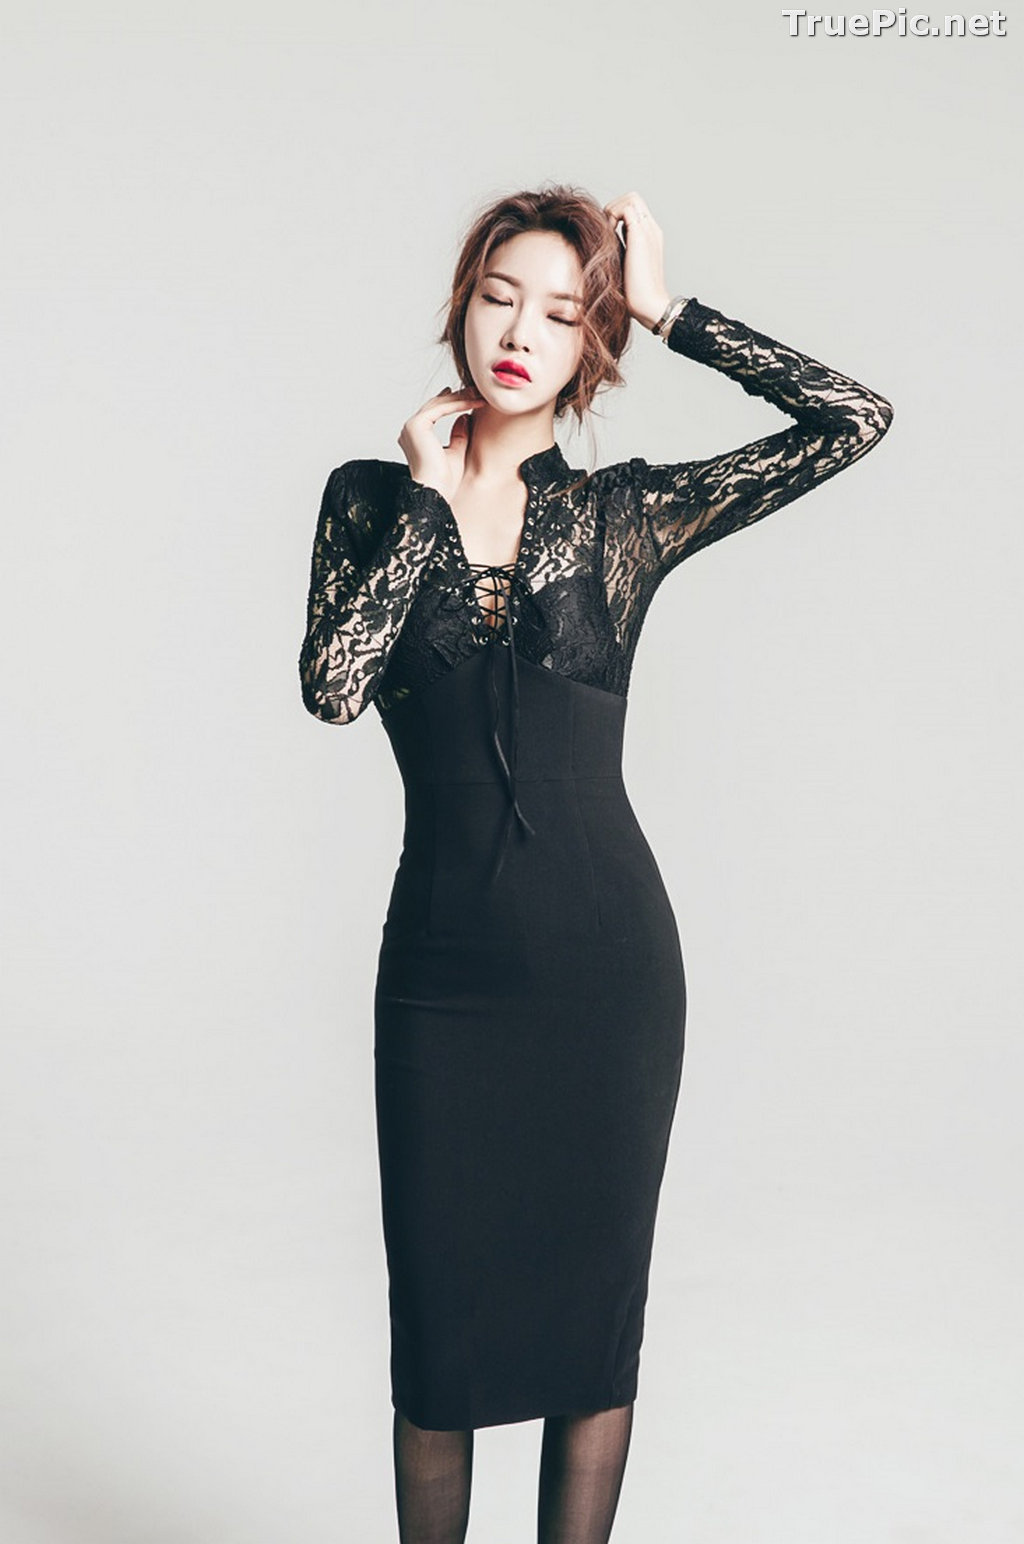 Image Korean Beautiful Model – Park Jung Yoon – Fashion Photography #11 - TruePic.net - Picture-65